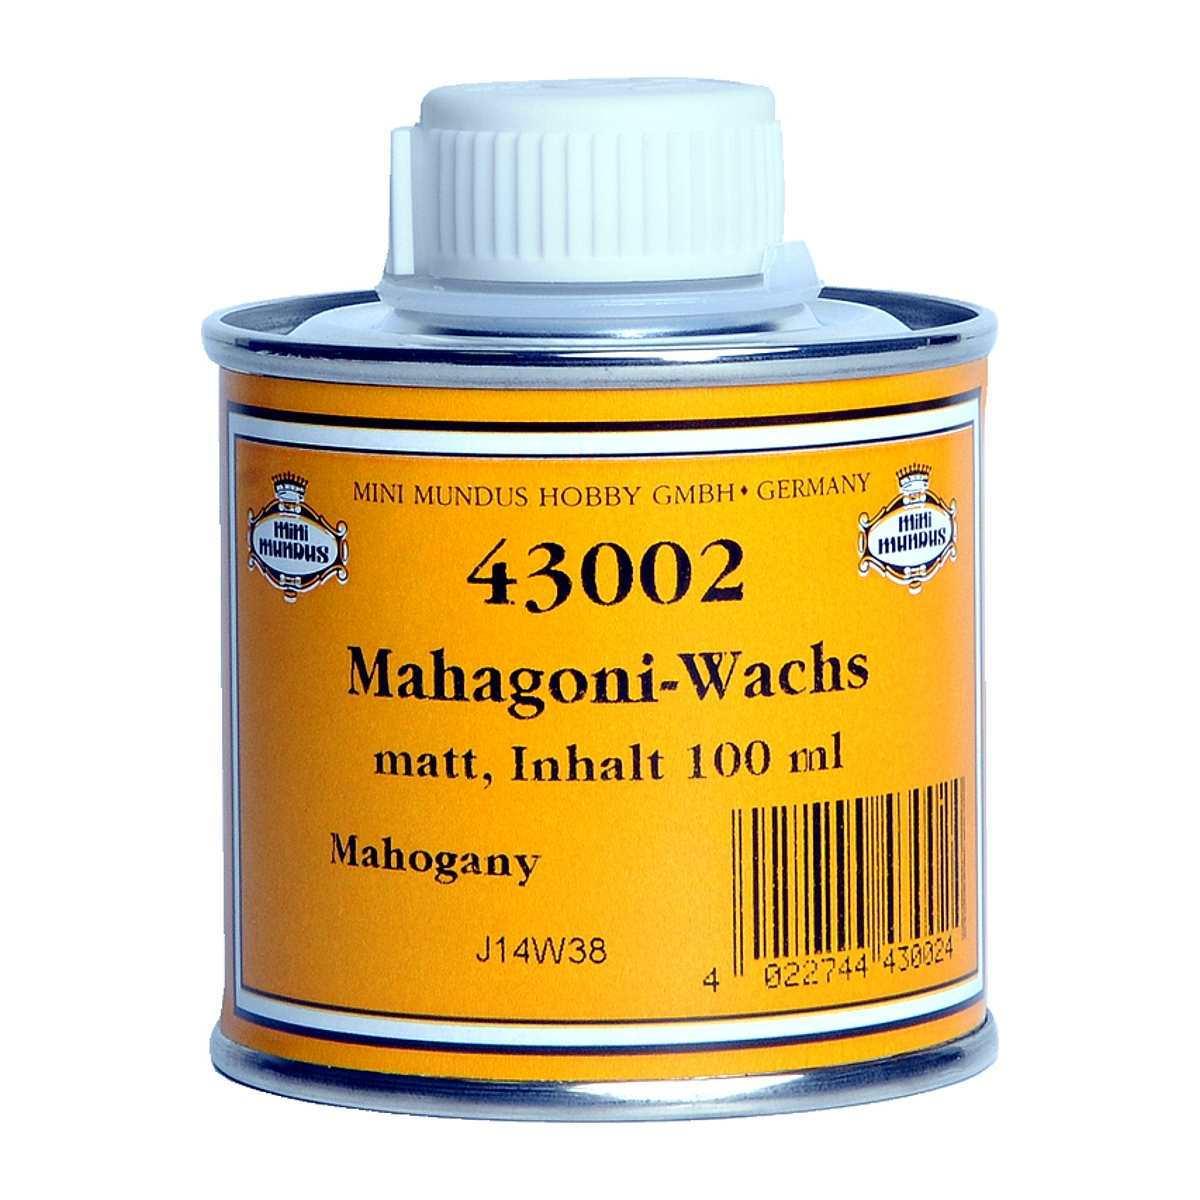 Mahagoni-Flüssigwachs